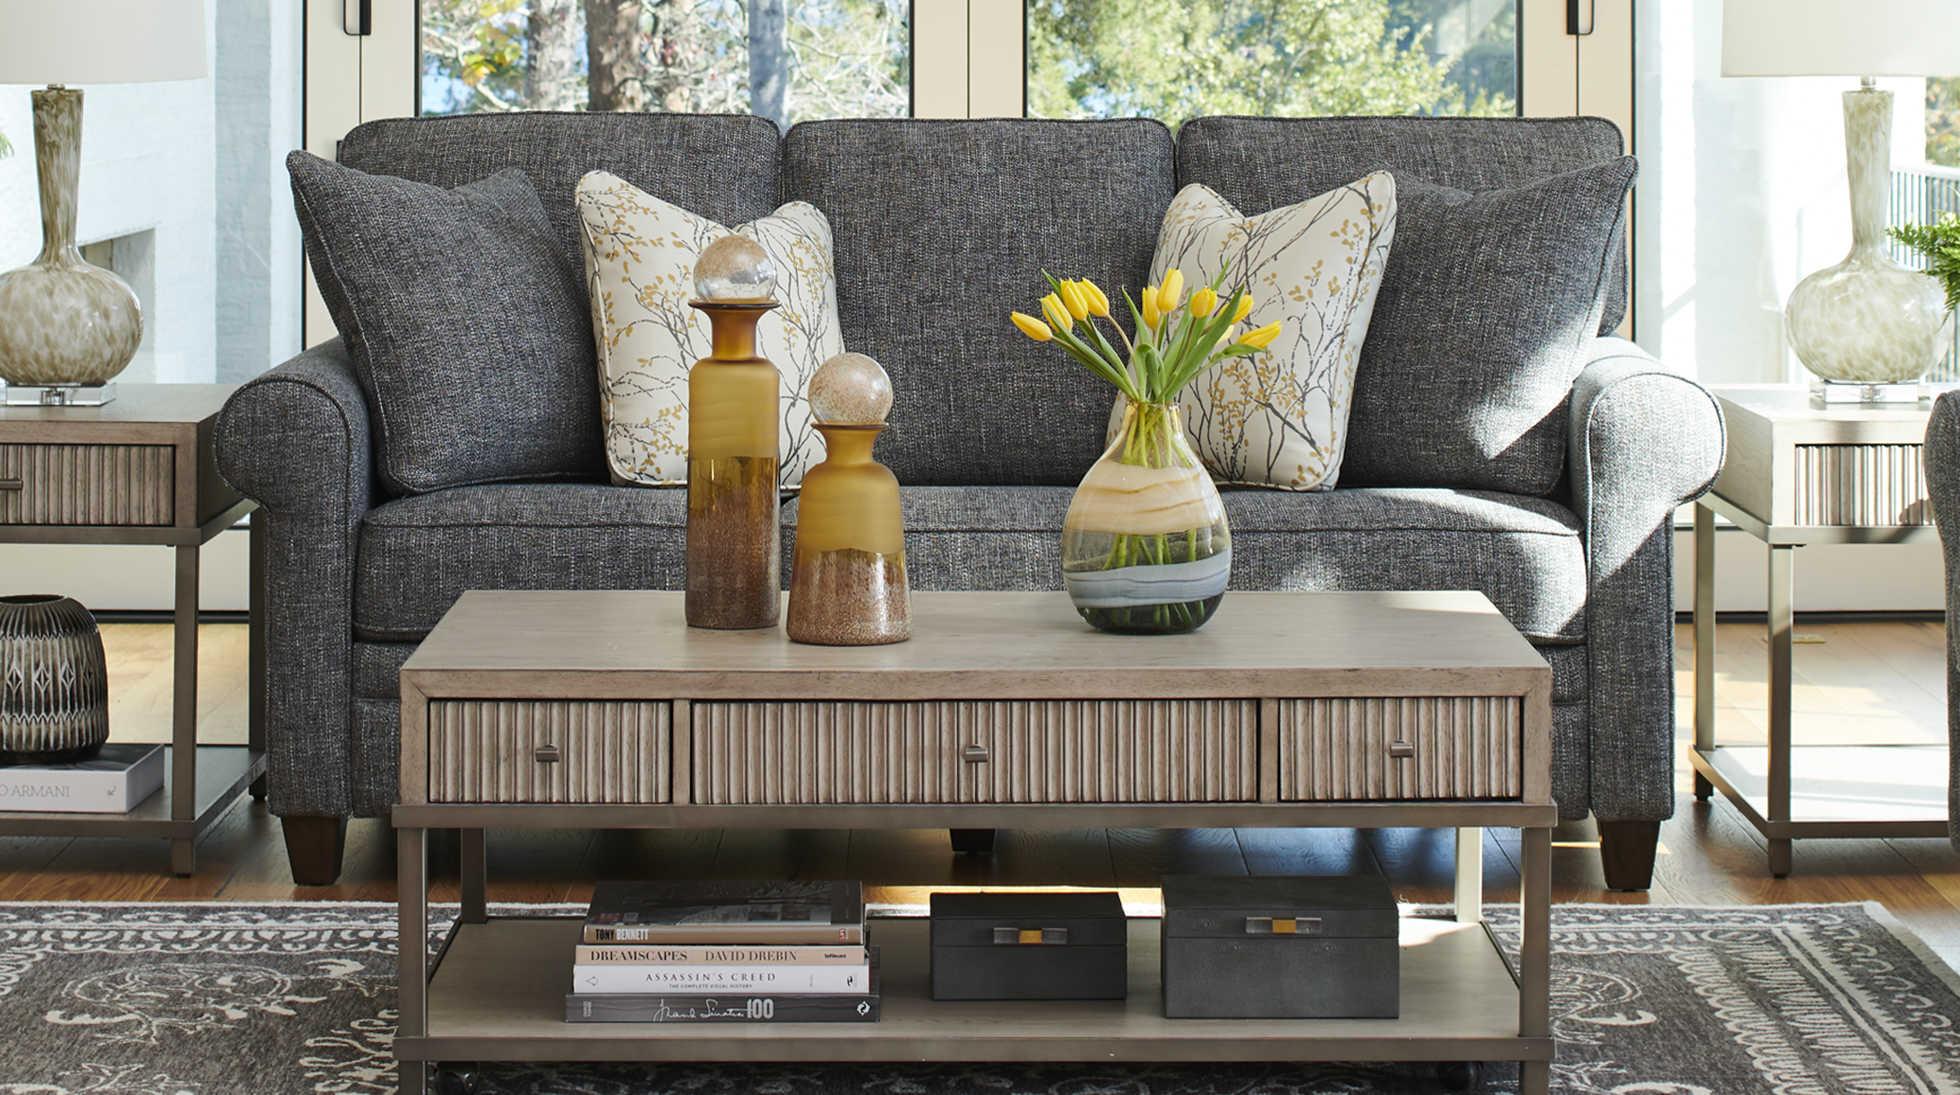 Colby duo® Reclining Sofa room scene